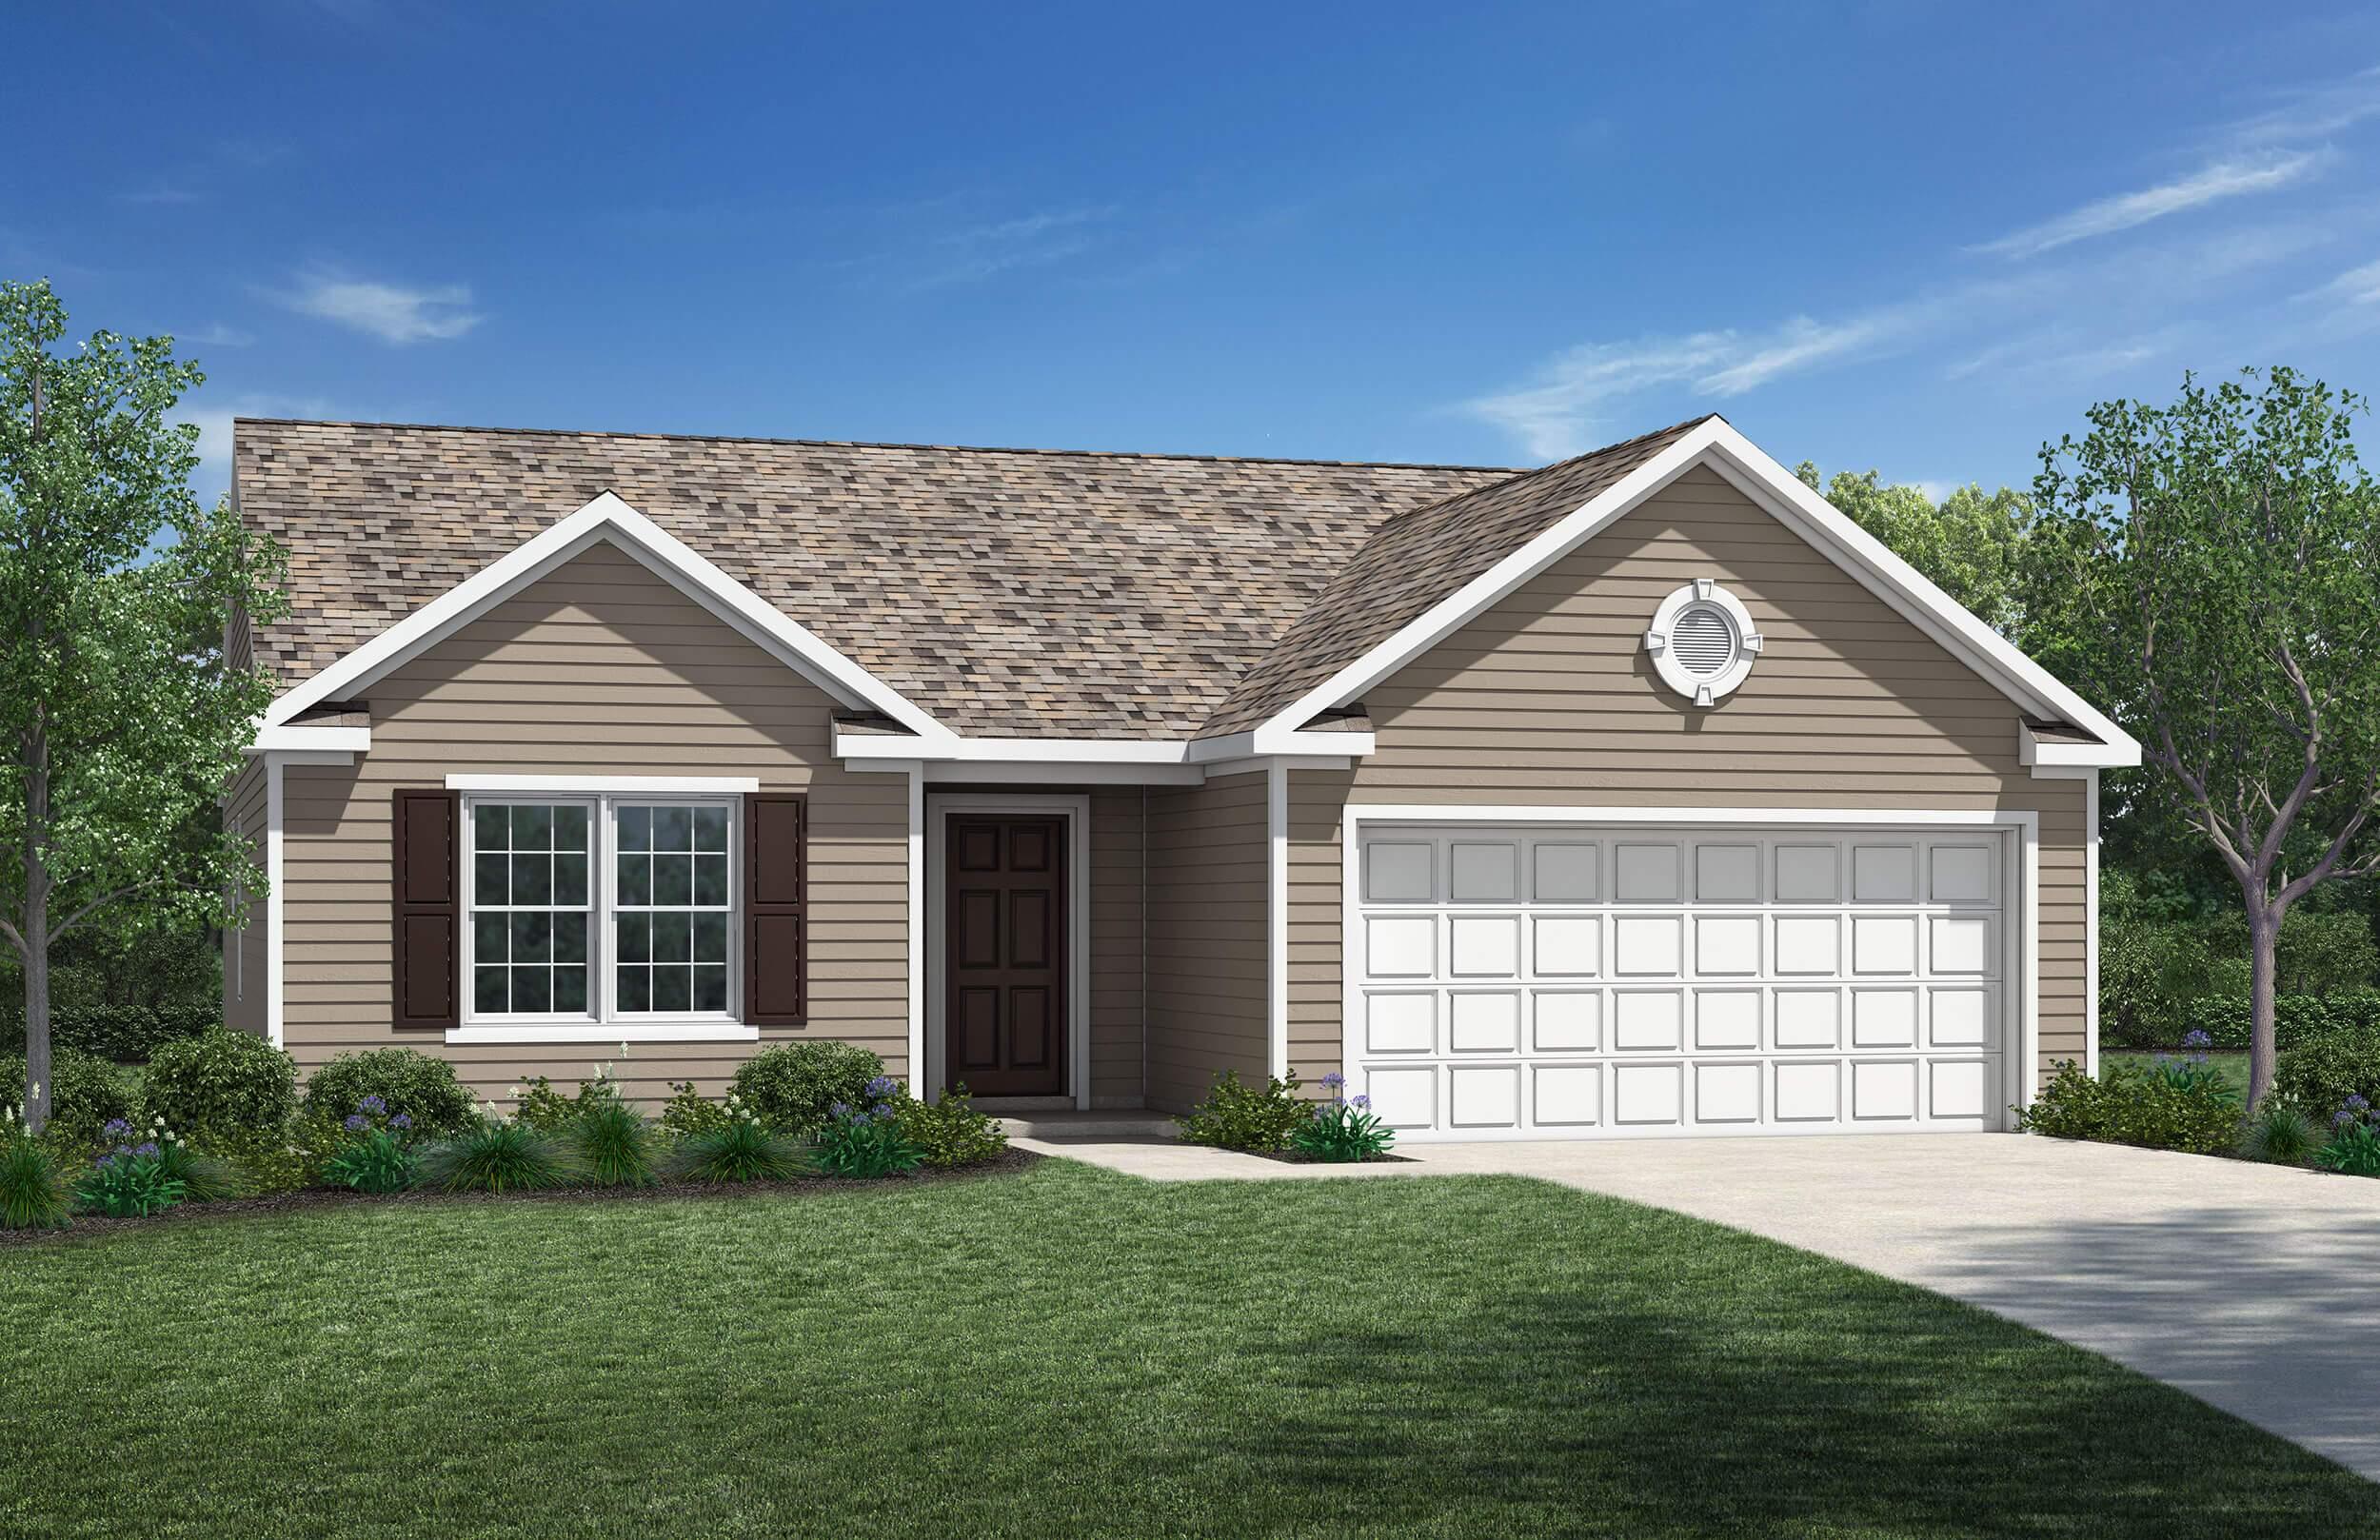 Stratford-Design-at-Weaver Ridge-in-Marysville